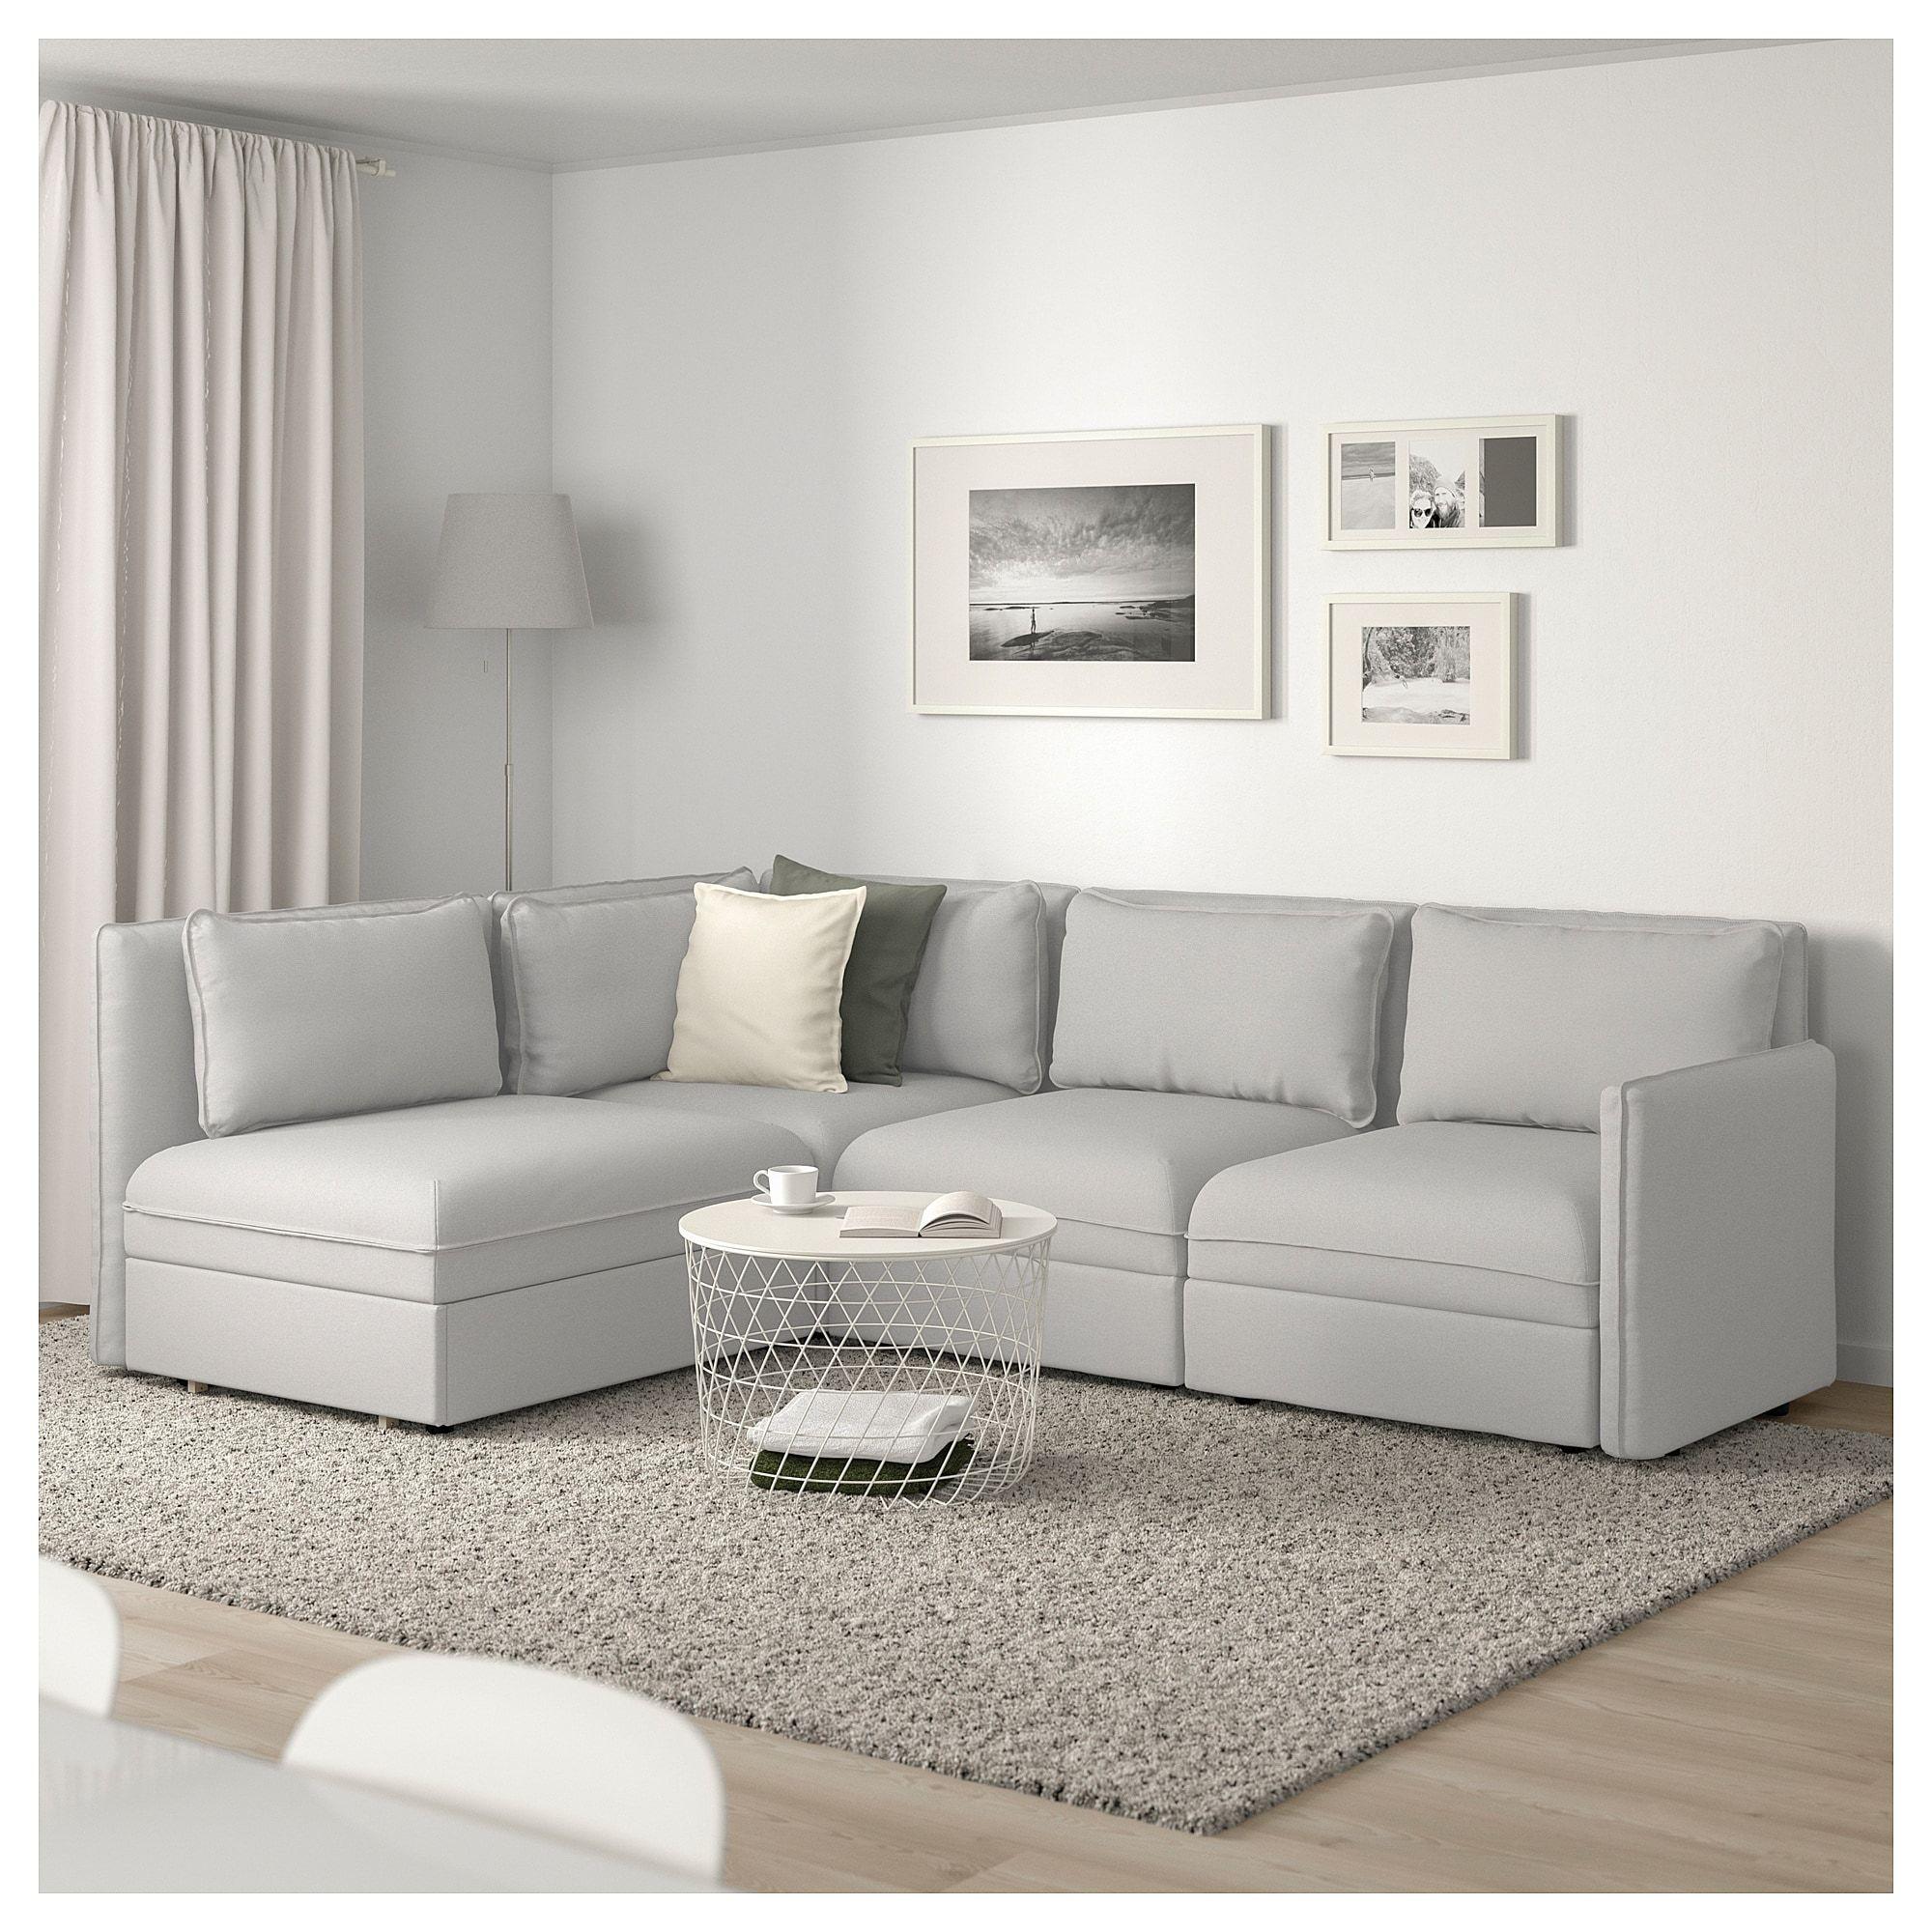 Products Modular Corner Sofa Livingroom Layout Vallentuna